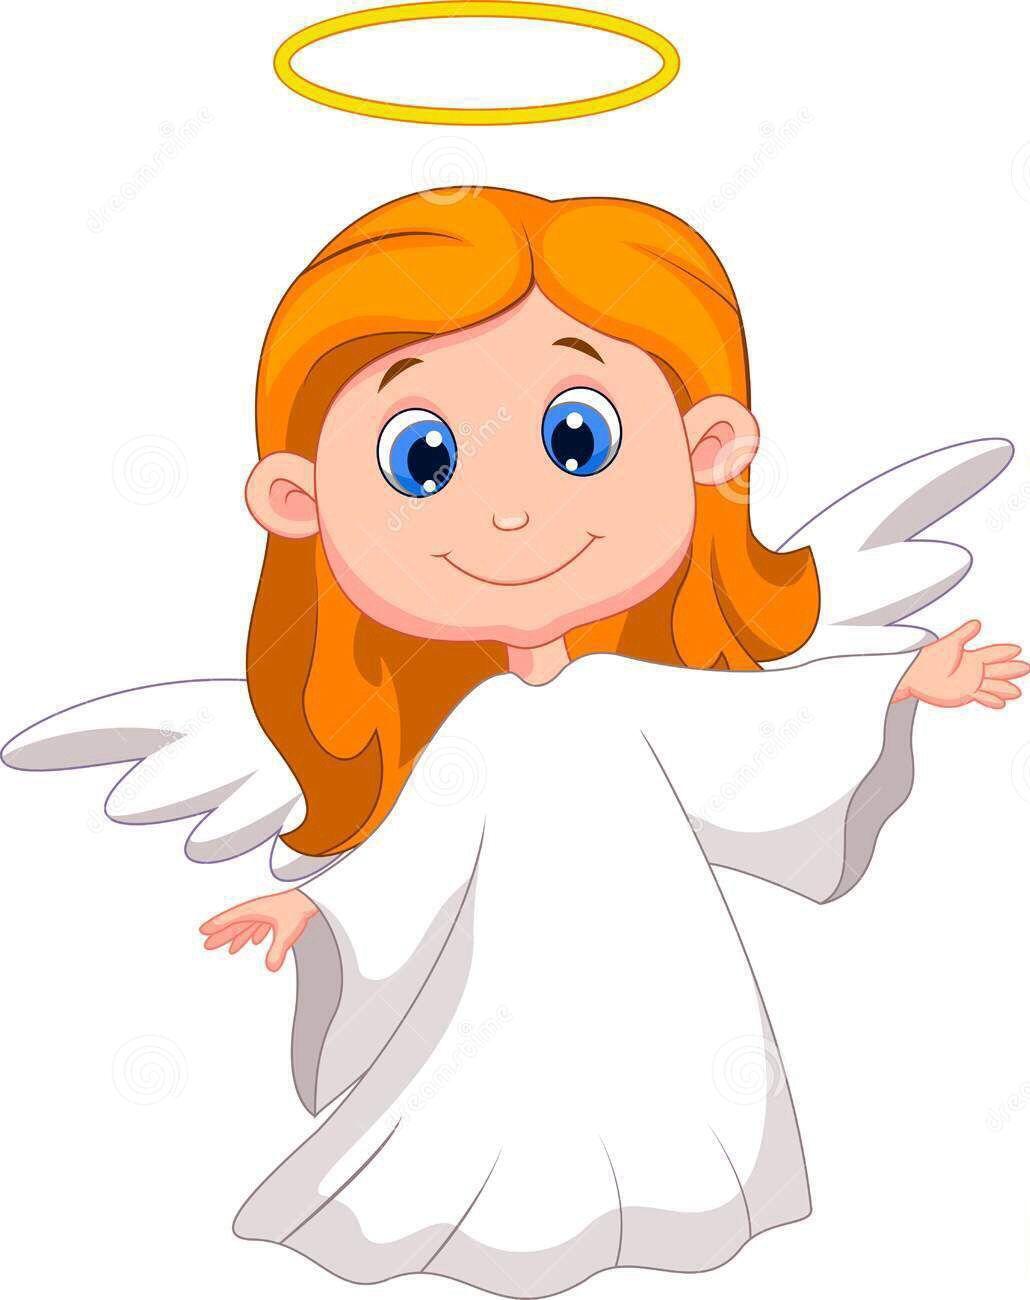 Pin by ANA sanchez on Angels | Angel cartoon, Angel, Angel art